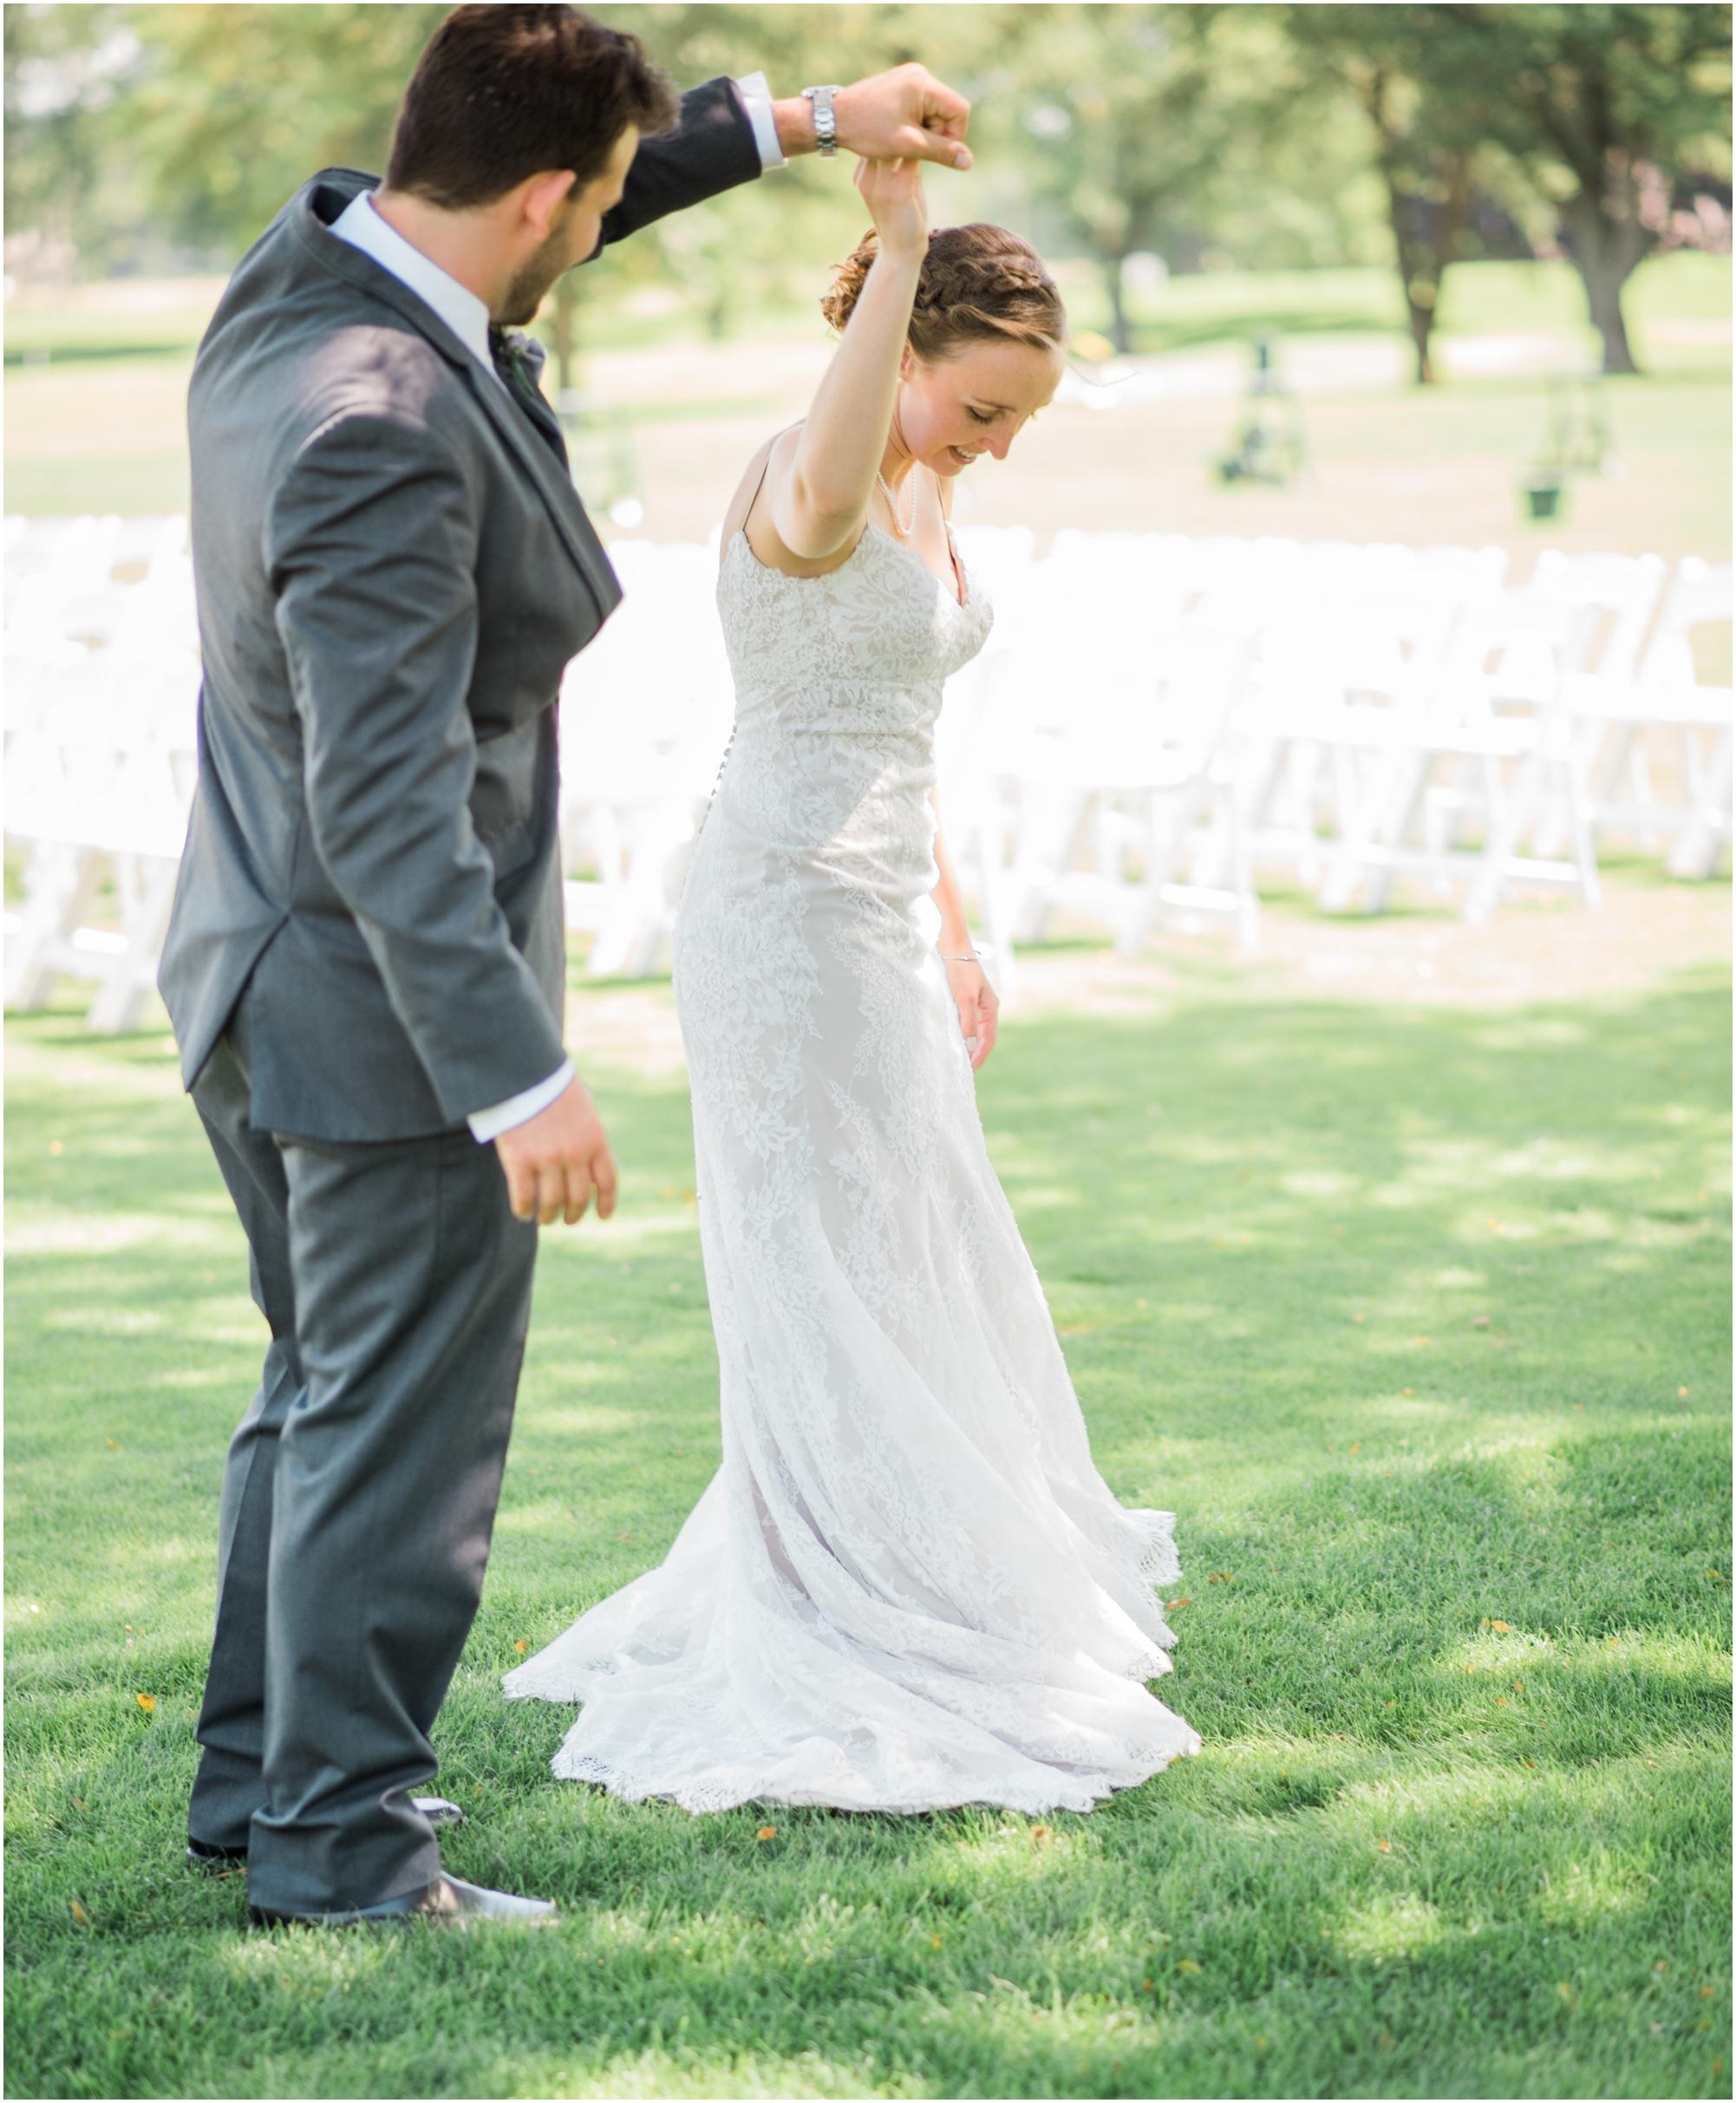 Wisconsin-Wedding-Photographer-Reedsburg-Country-Club-Kaela-and Matt-Wedding-62.jpg